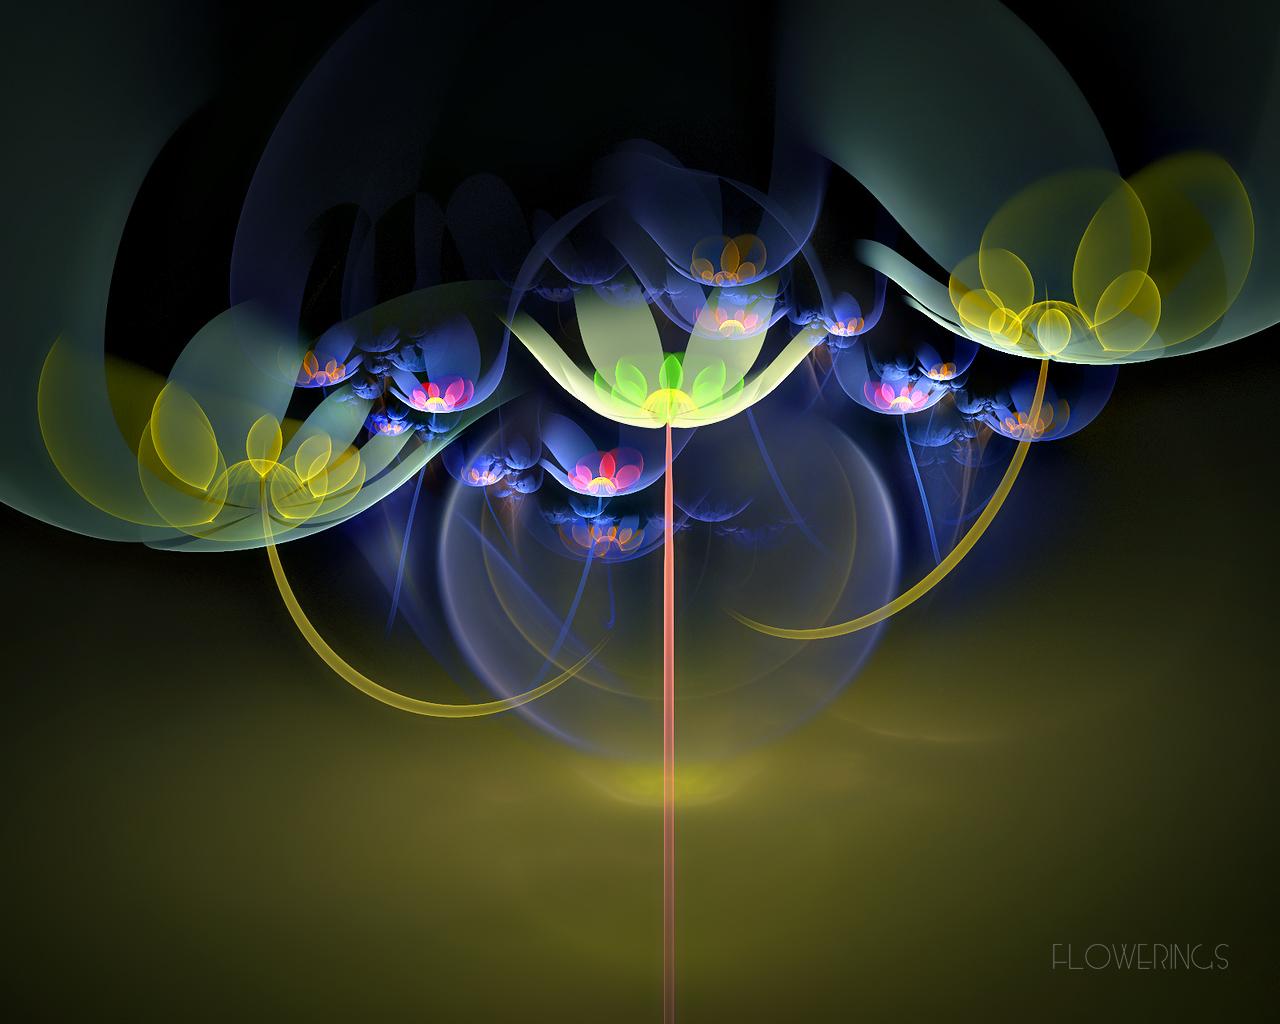 http://3.bp.blogspot.com/_bx5_RNhhR-M/TUEHv8TYFaI/AAAAAAAAB5w/na6_zk89R_w/s1600/3d%2BWallpapers%2B%25287%2529.jpg